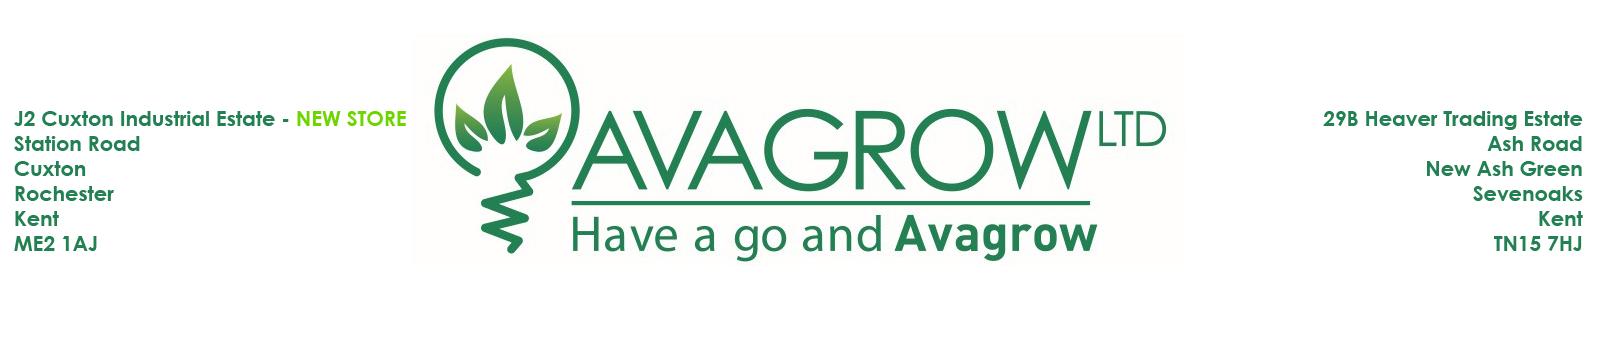 AVAGROW LTD